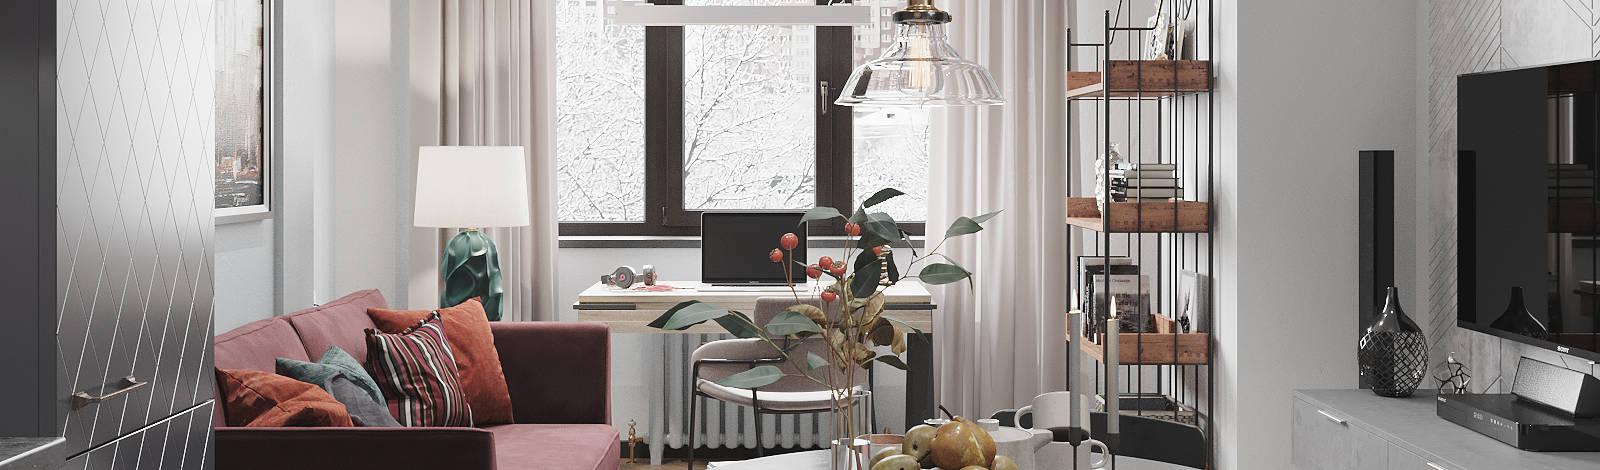 Студия NATALYA SOLNTSEVA Interiors Design